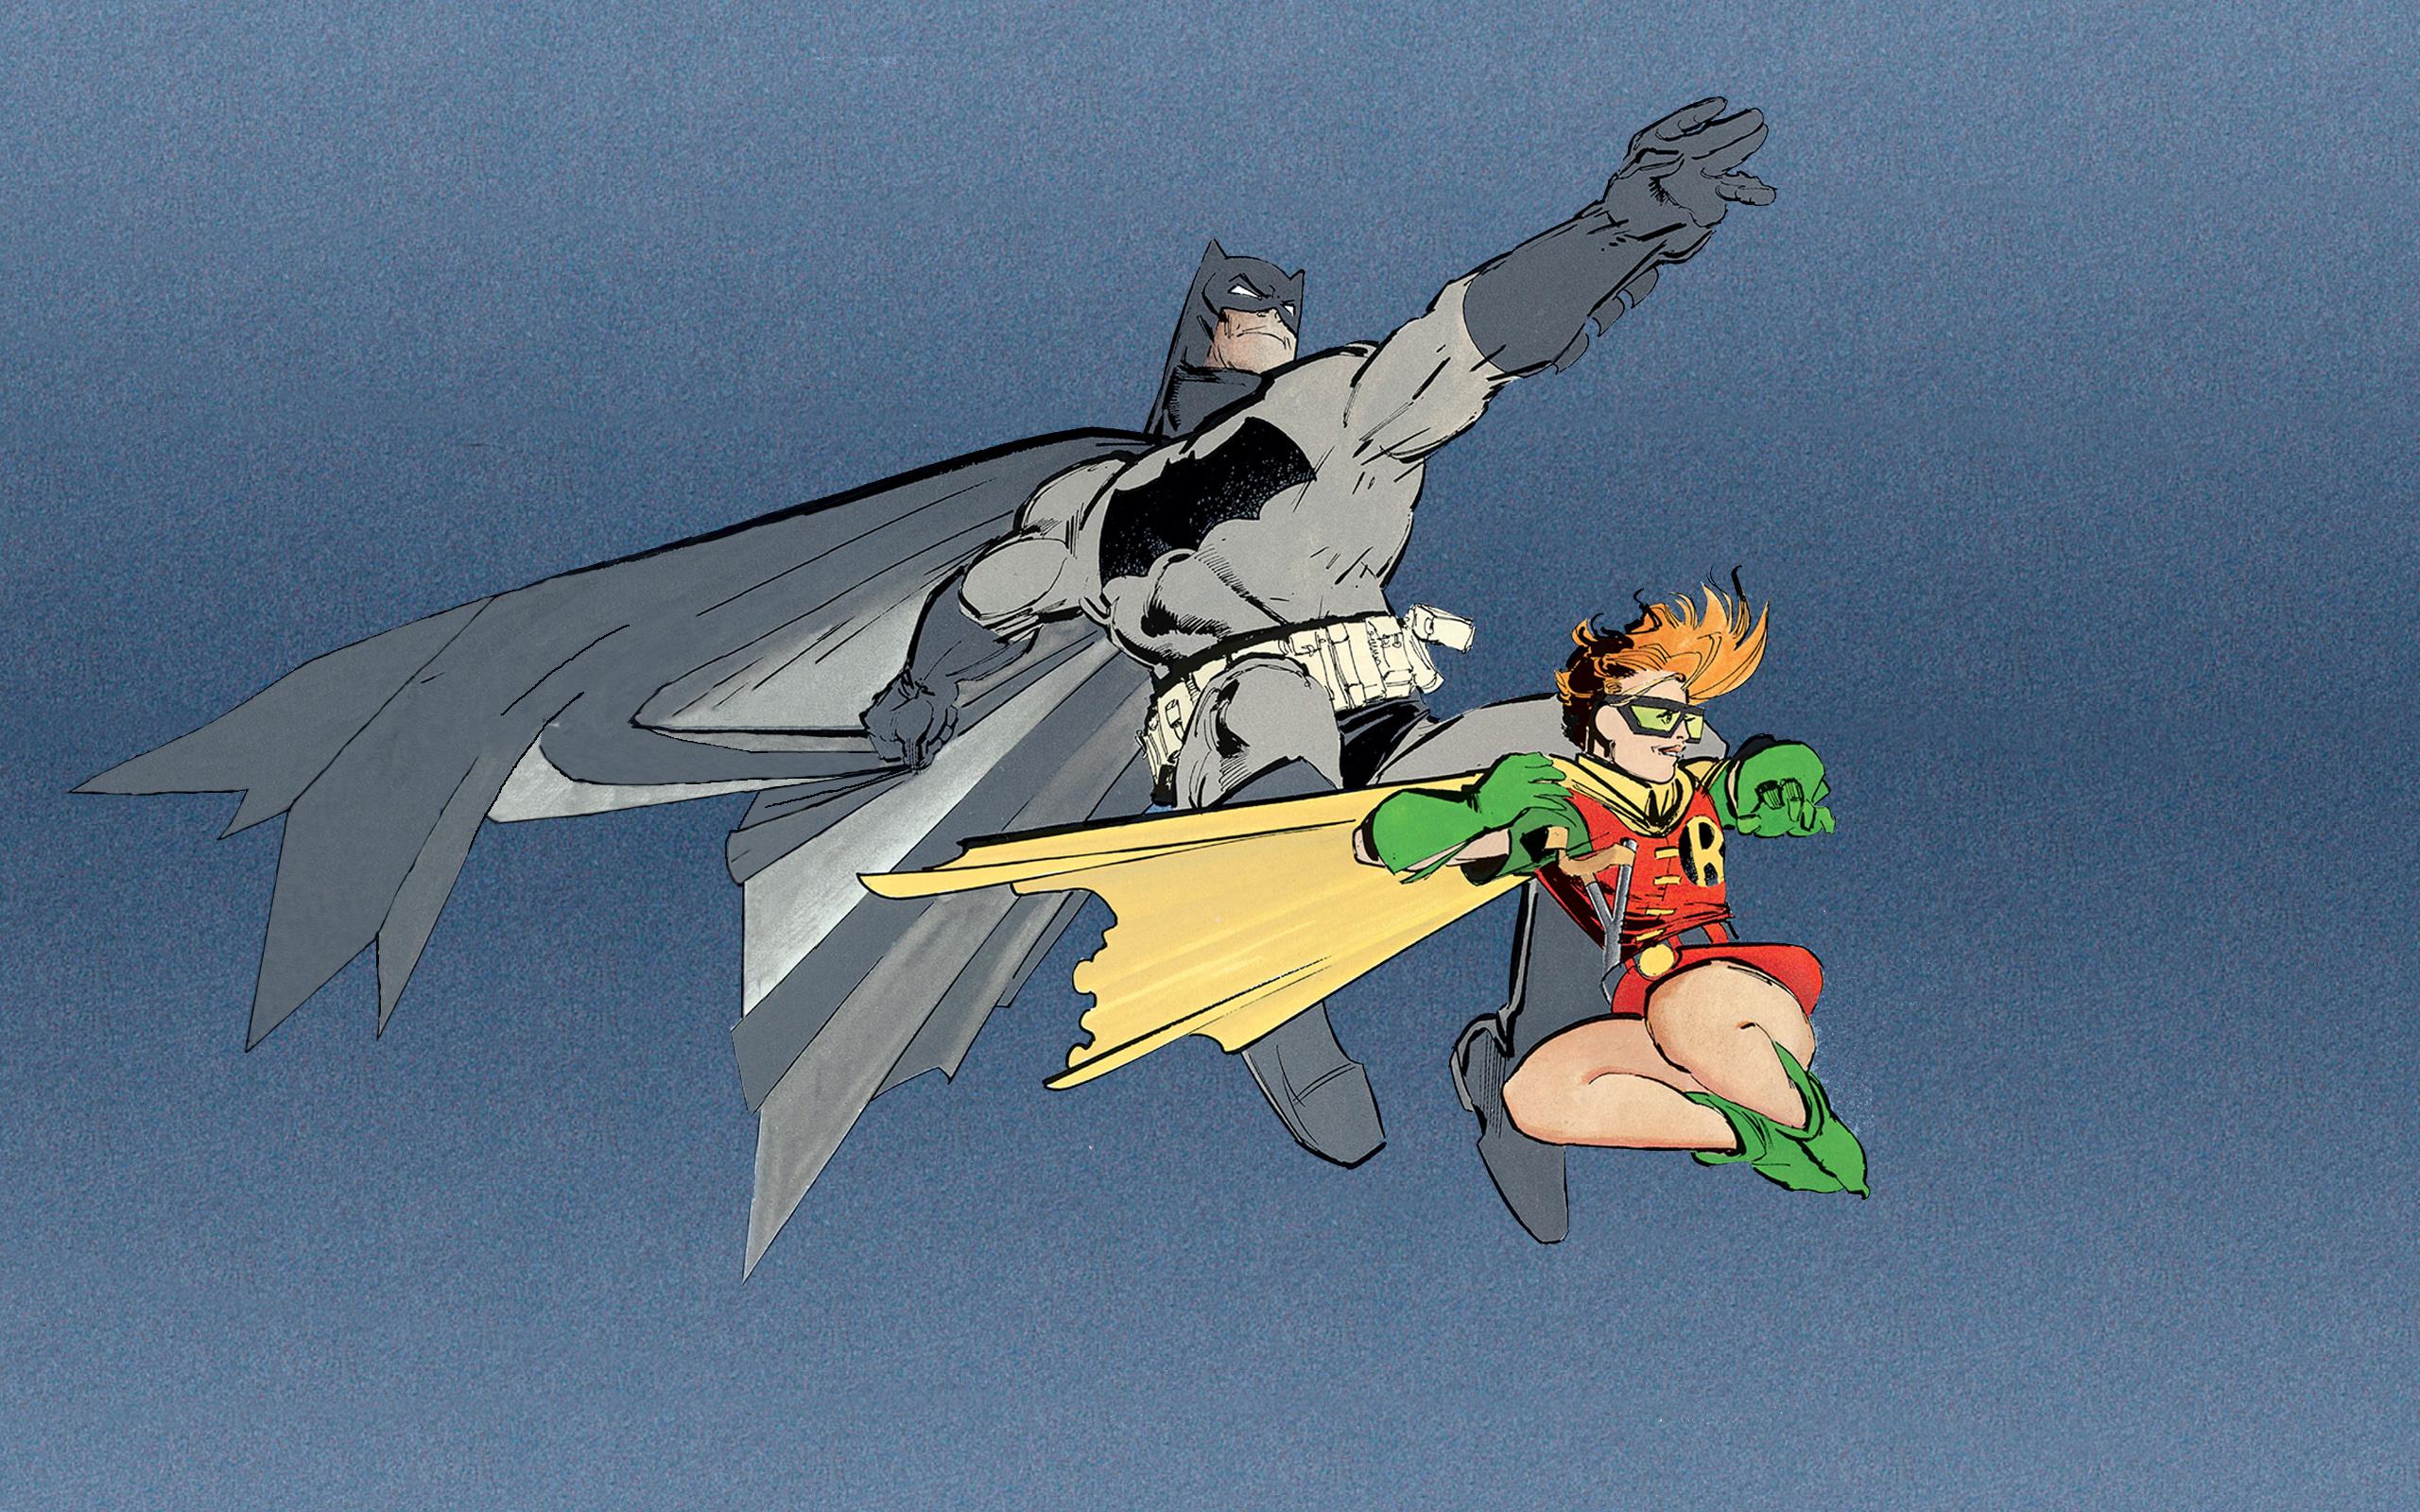 Batman Dark Knight Returns Wallpaper - WallpaperSafari